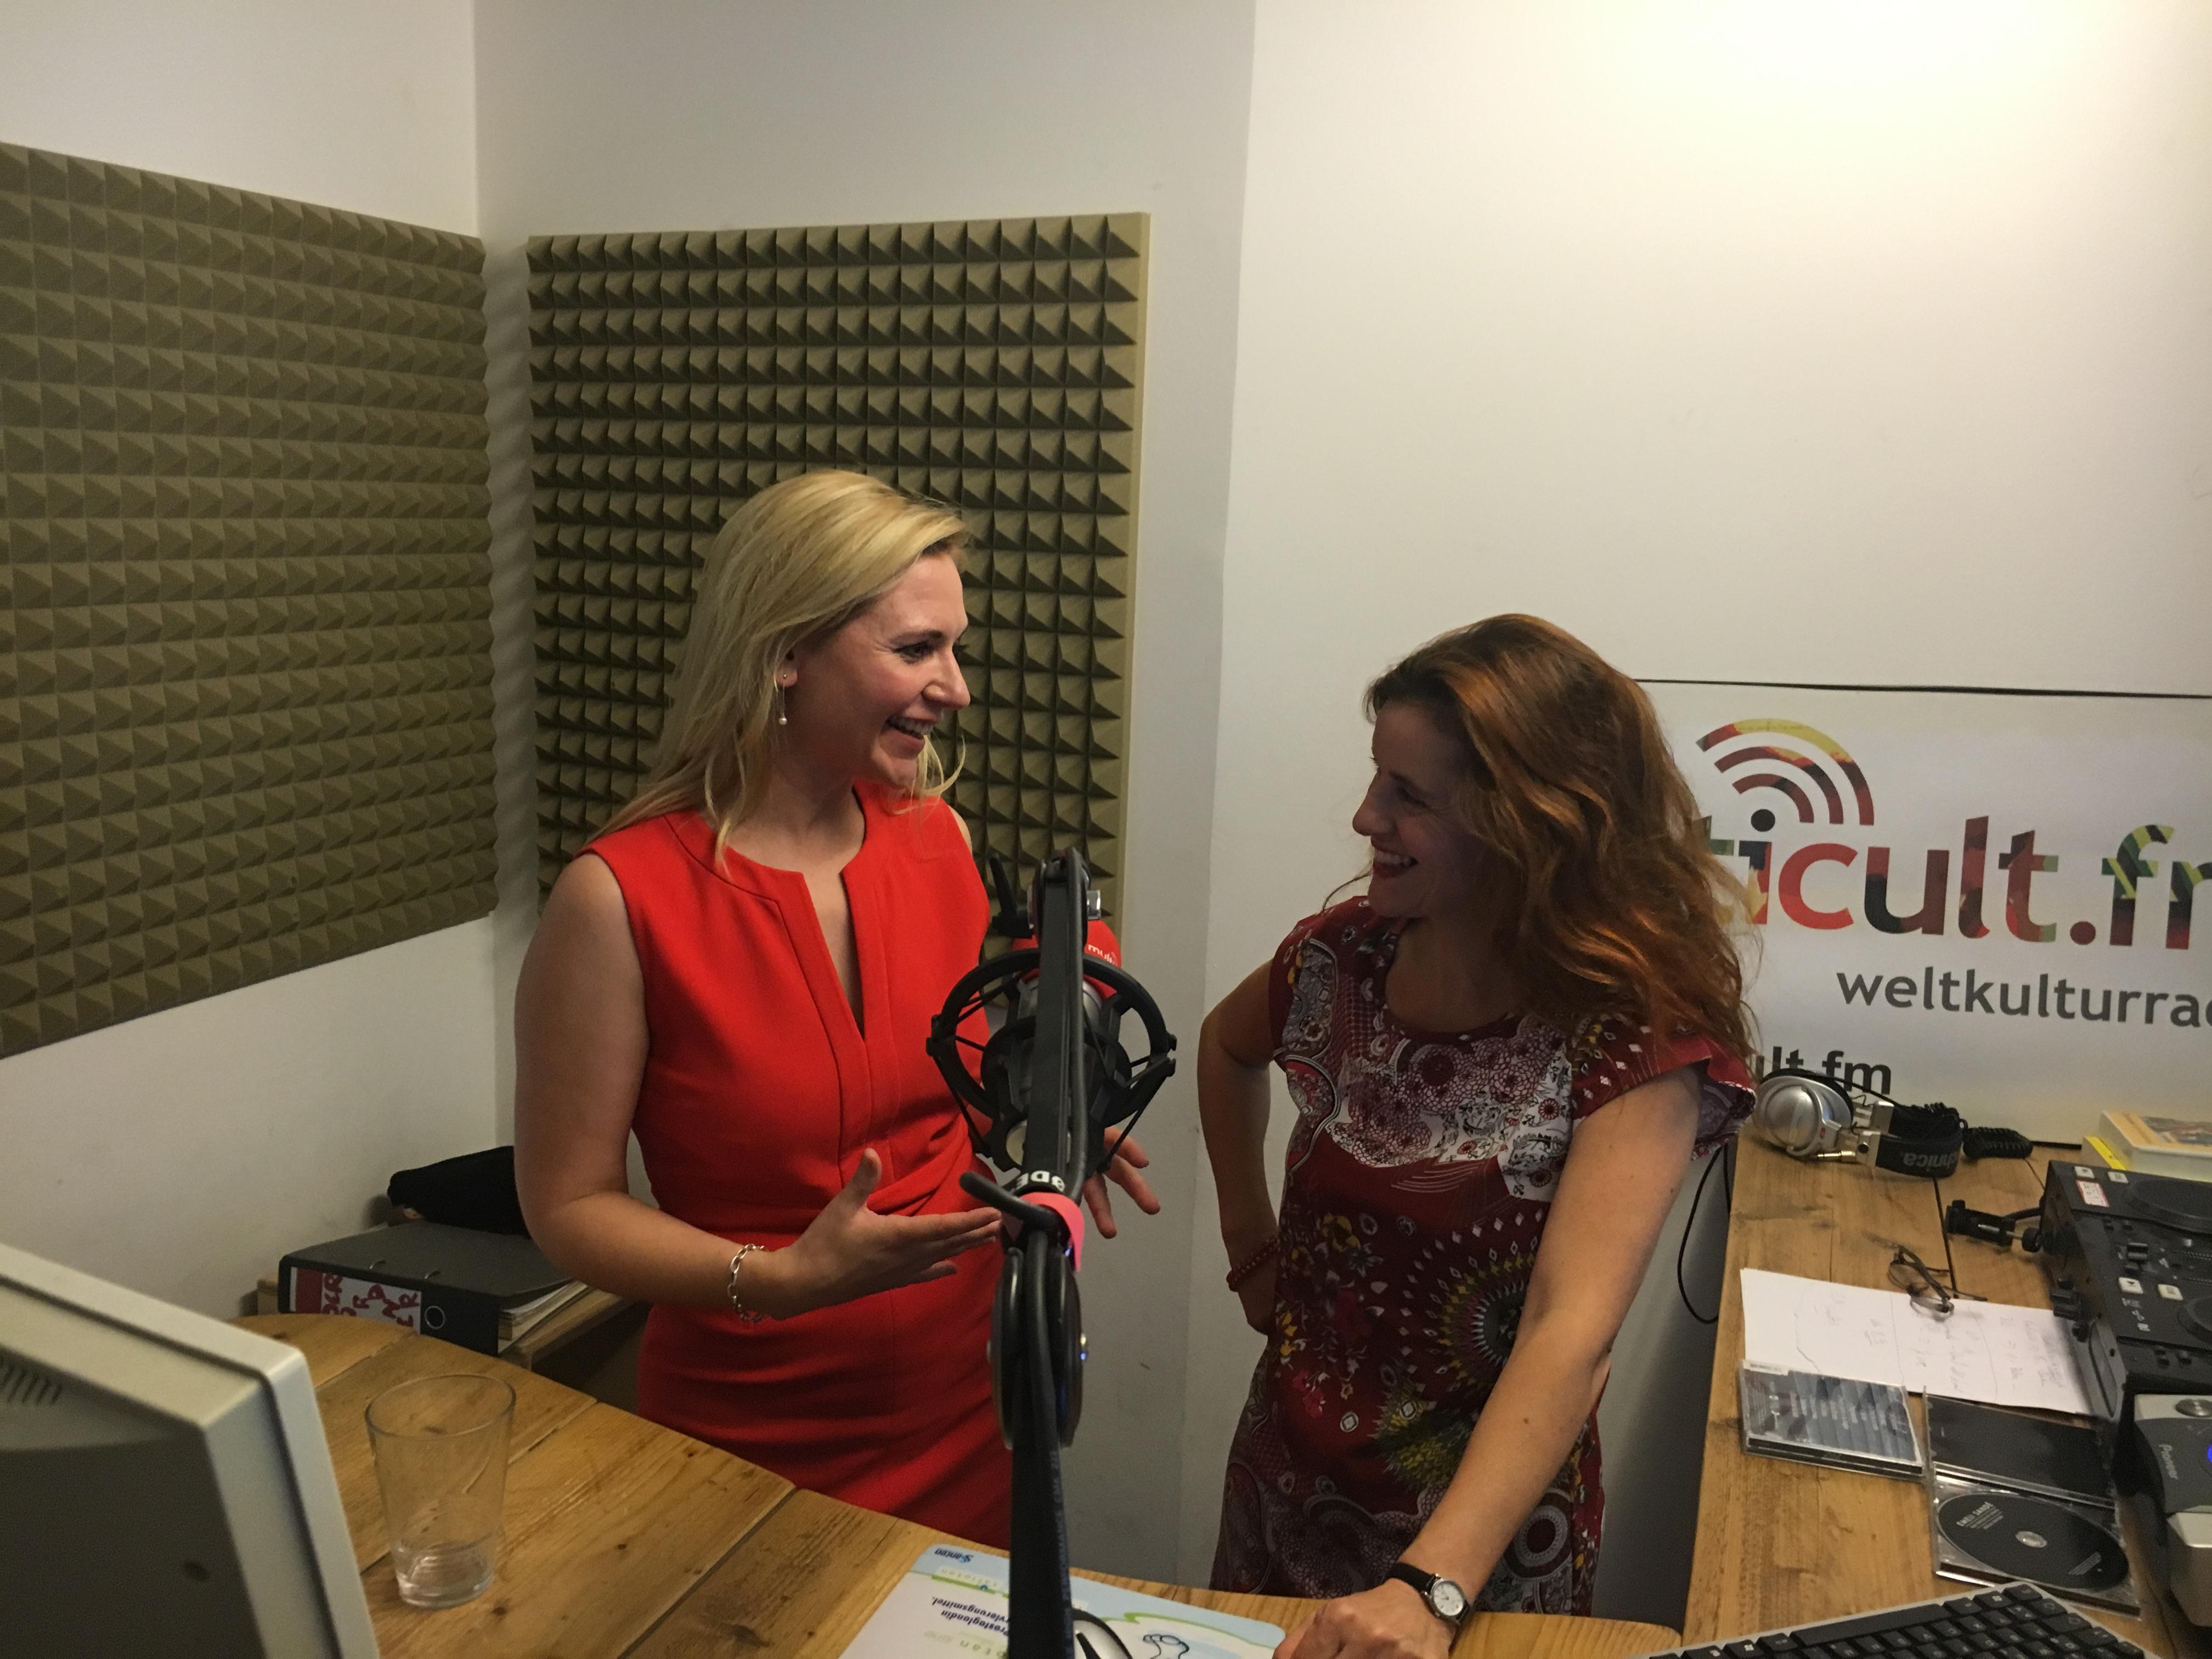 Radio: Sandra Pabst talks about Fempreneurship